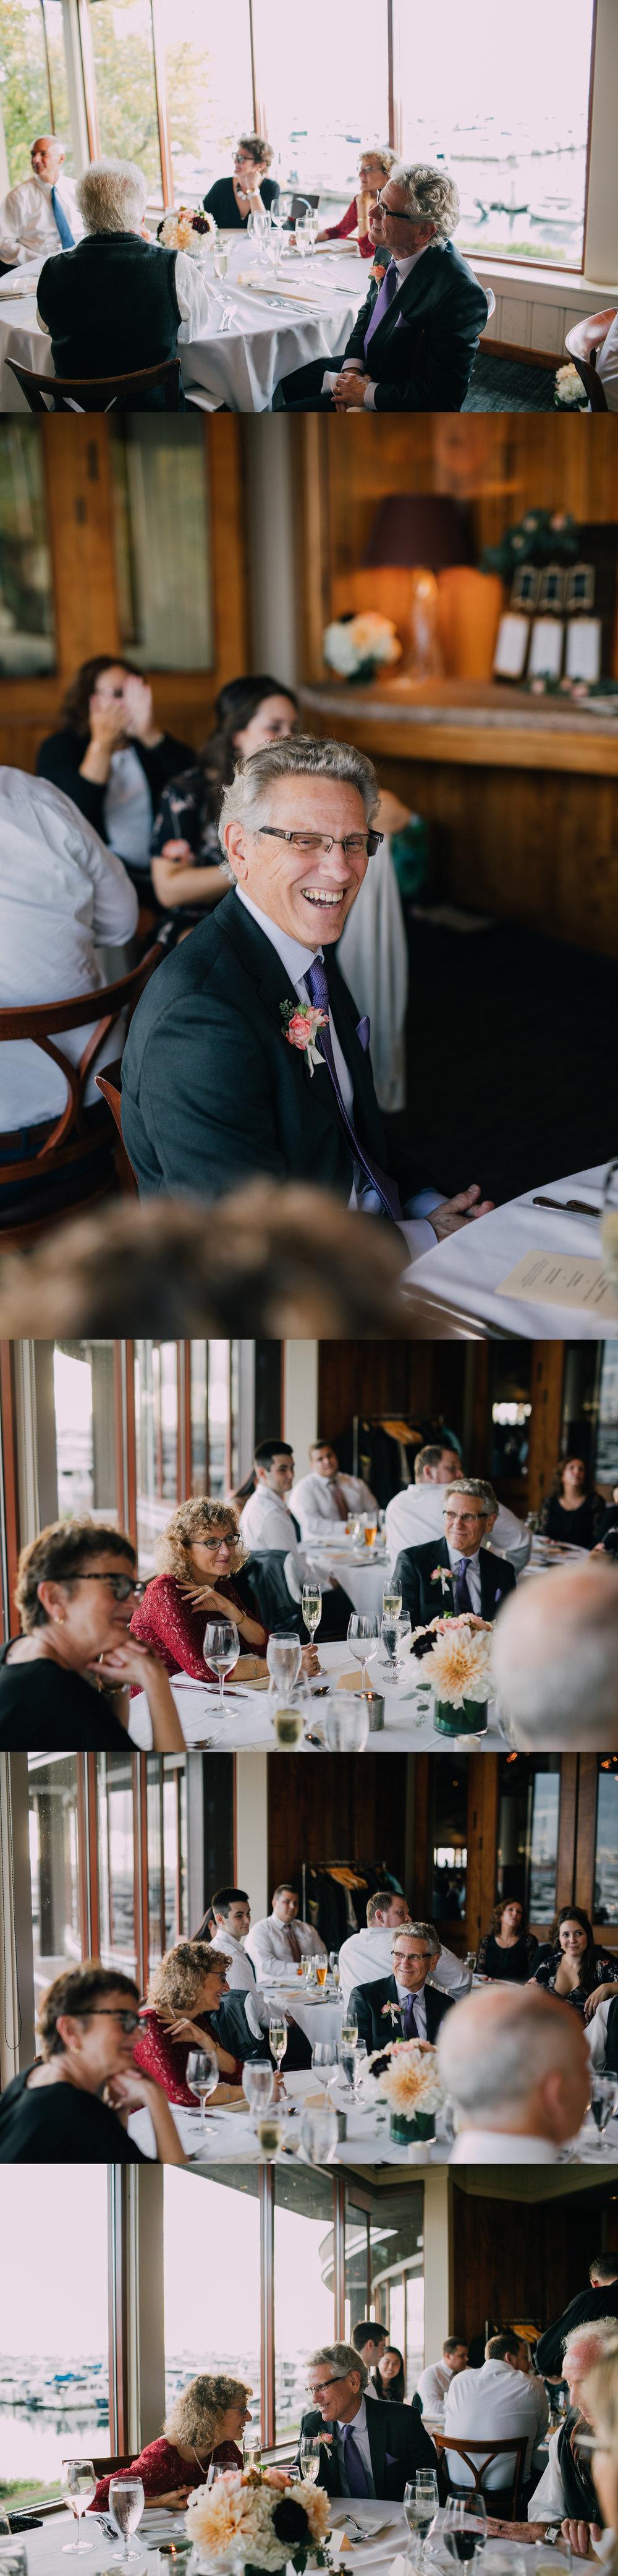 intimate small wedding photographer seattle washington pnw restaurant reception -8.jpg